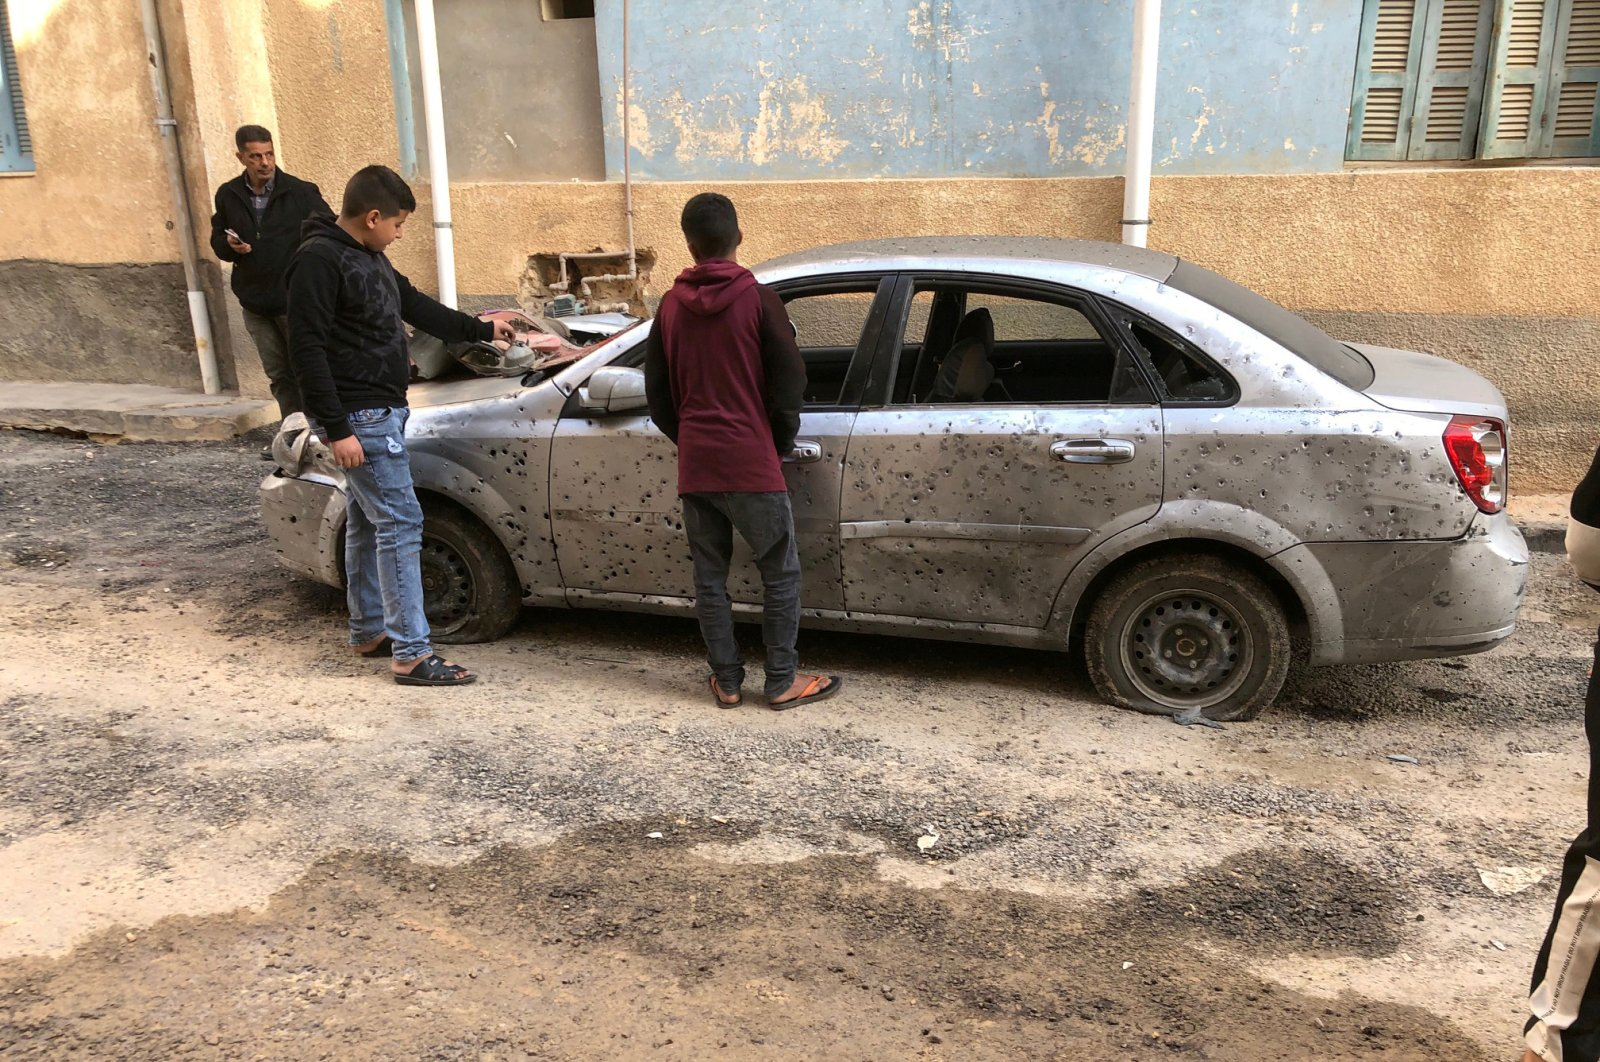 Libyan boys check a damaged car after a shell fell on a residential area at Hadba al-Badri district, in Tripoli, Libya Jan. 28, 2020. REUTERS